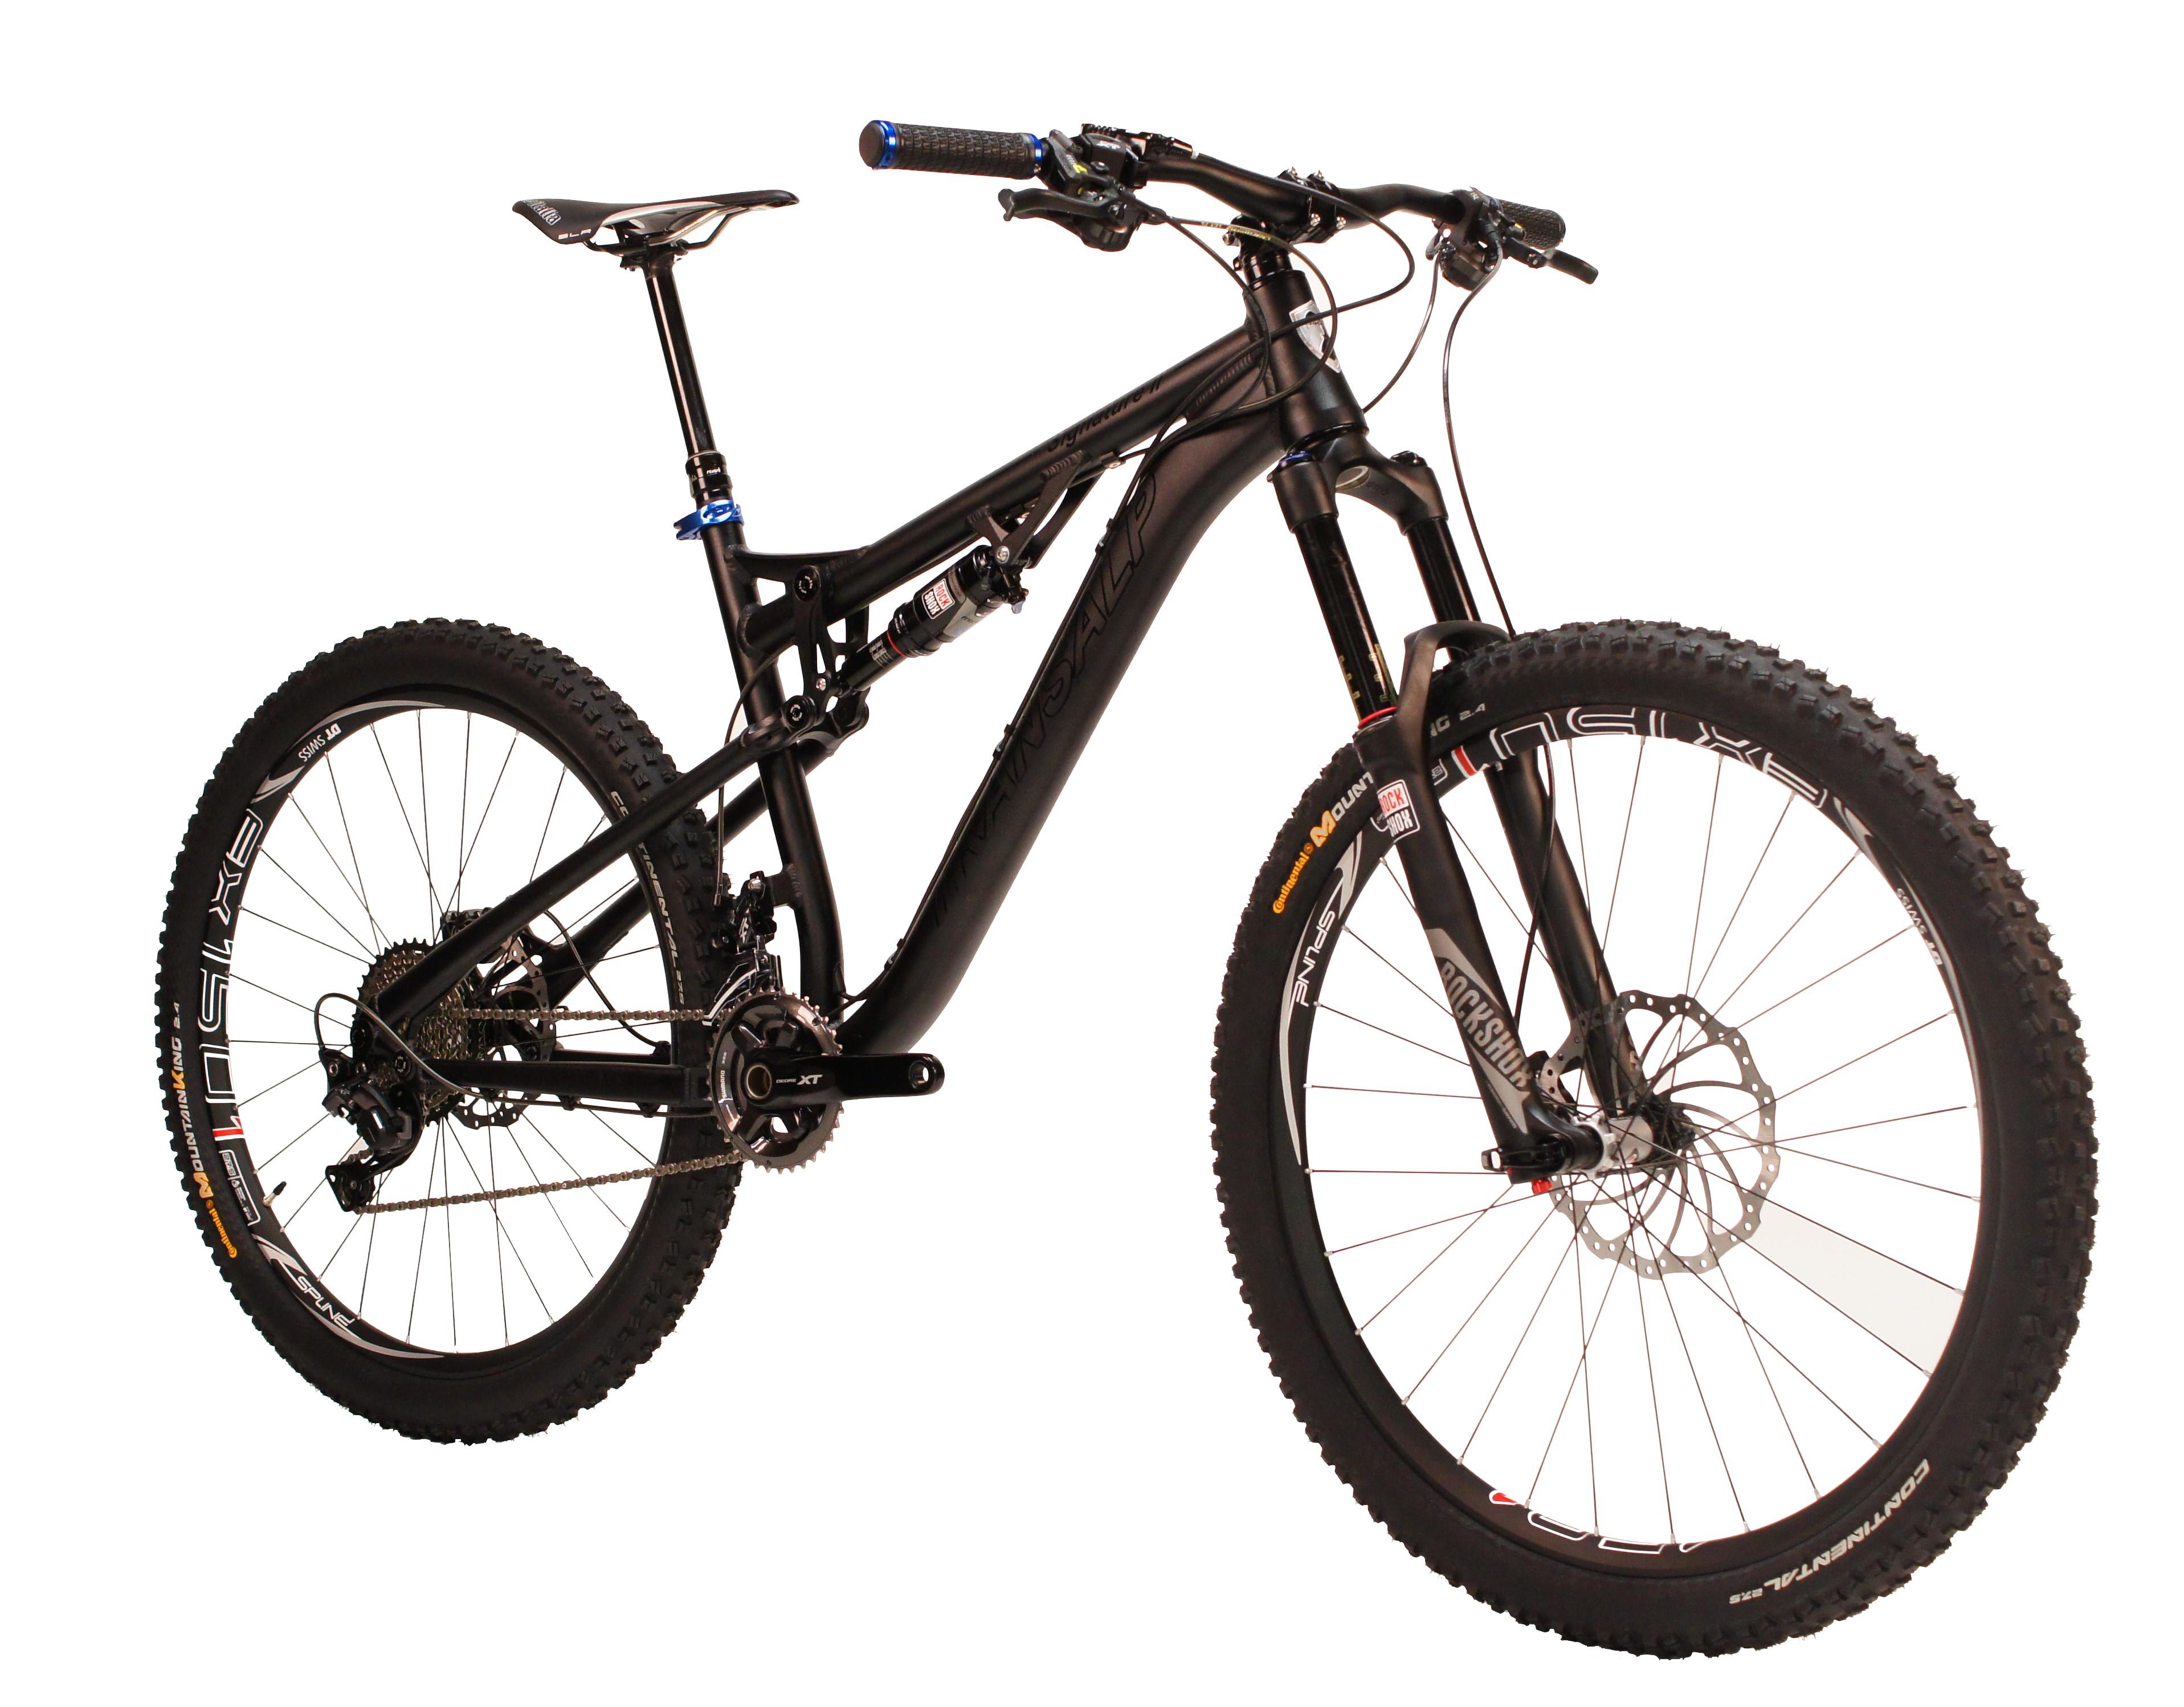 MTB - Konfigurator - Transalp Bikes - Transalp Bikes